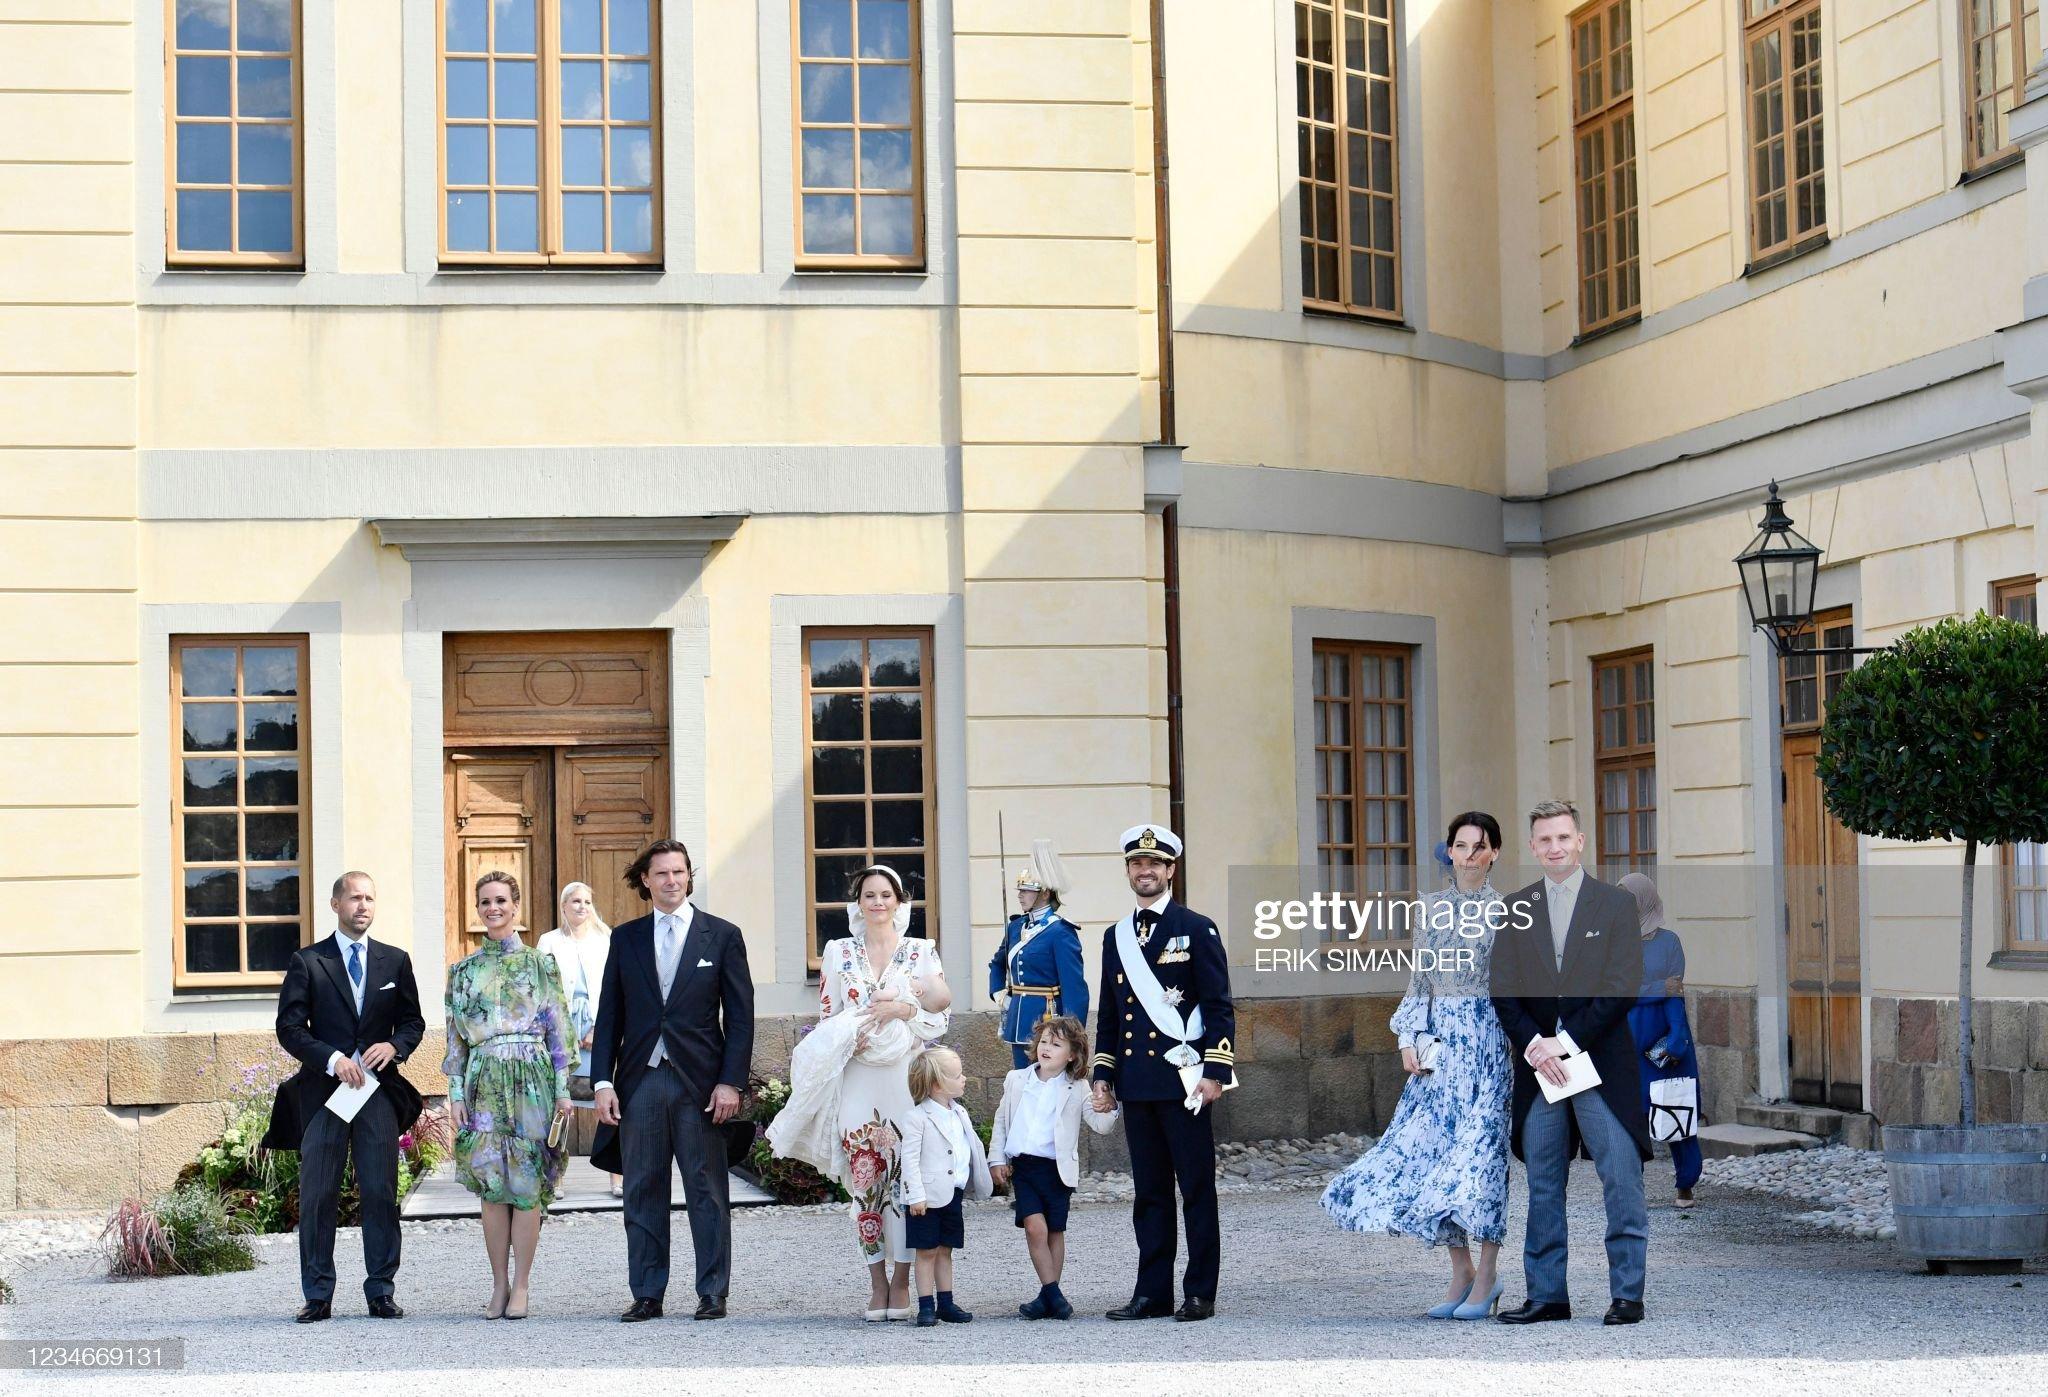 SWEDEN-ROYALS-RELIGION-CHRISTENING-JULIAN : News Photo